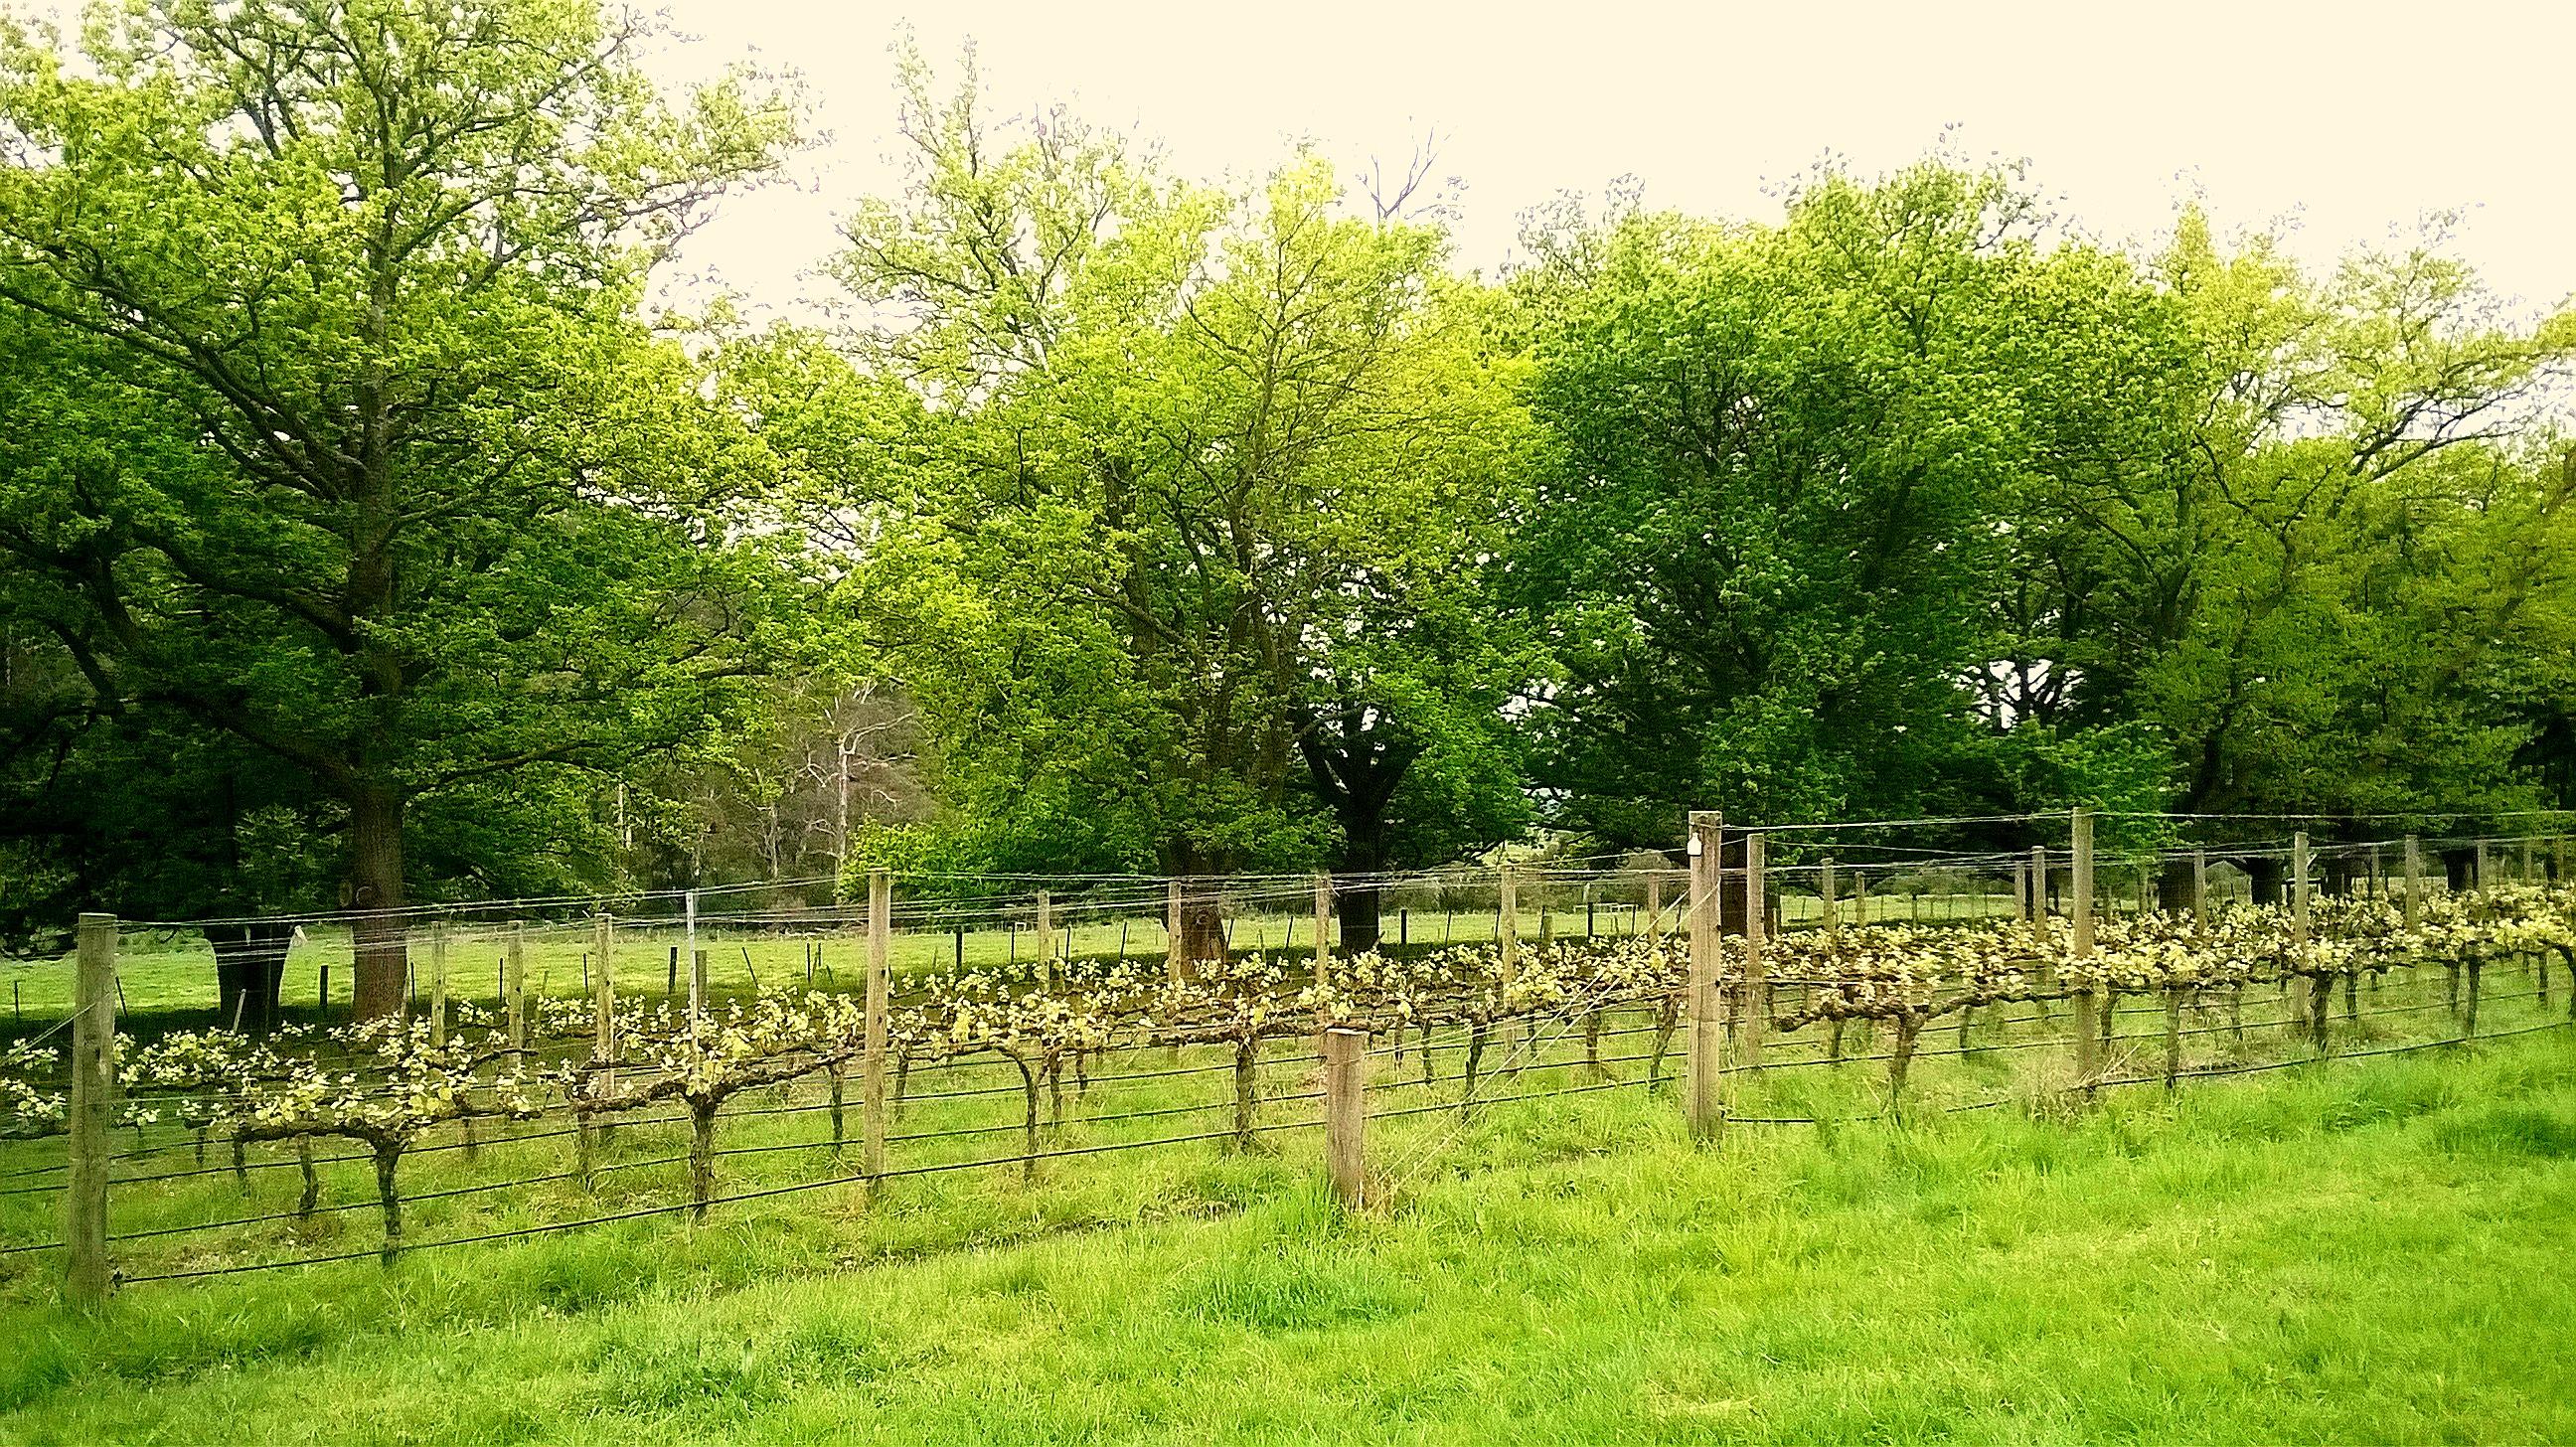 grapevines trail1.jpg